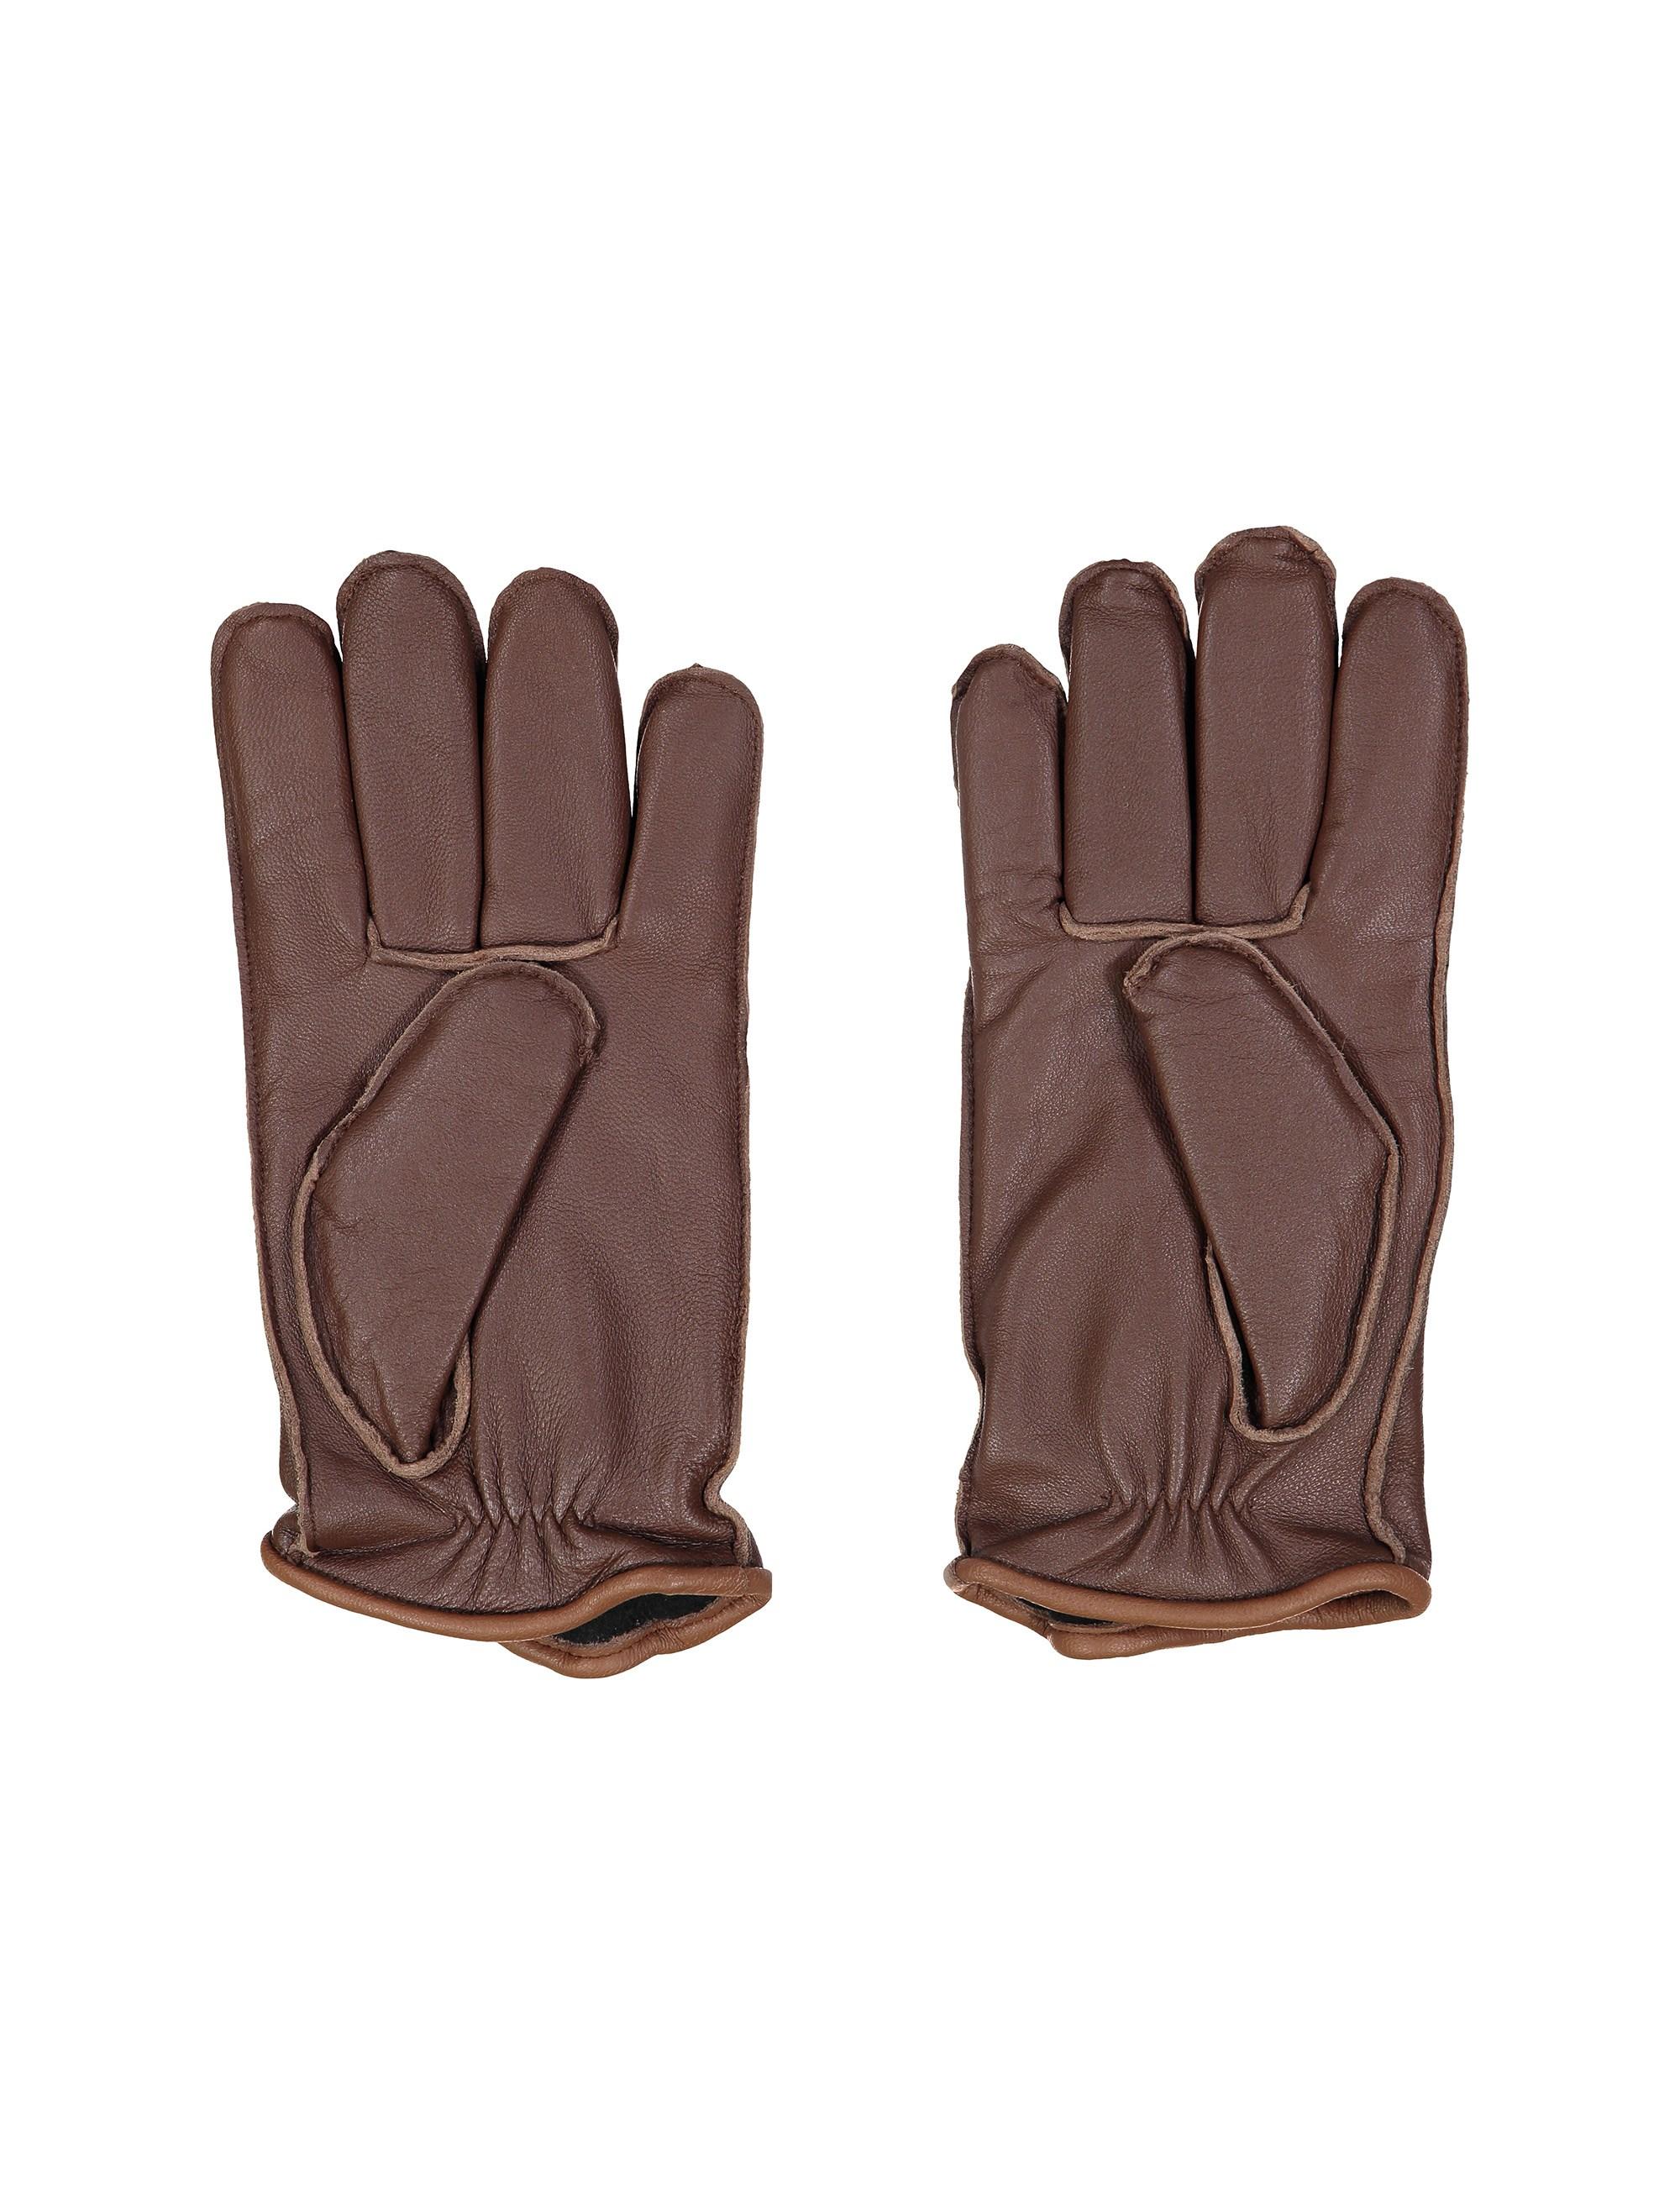 دستکش چرم زنانه - سلیو